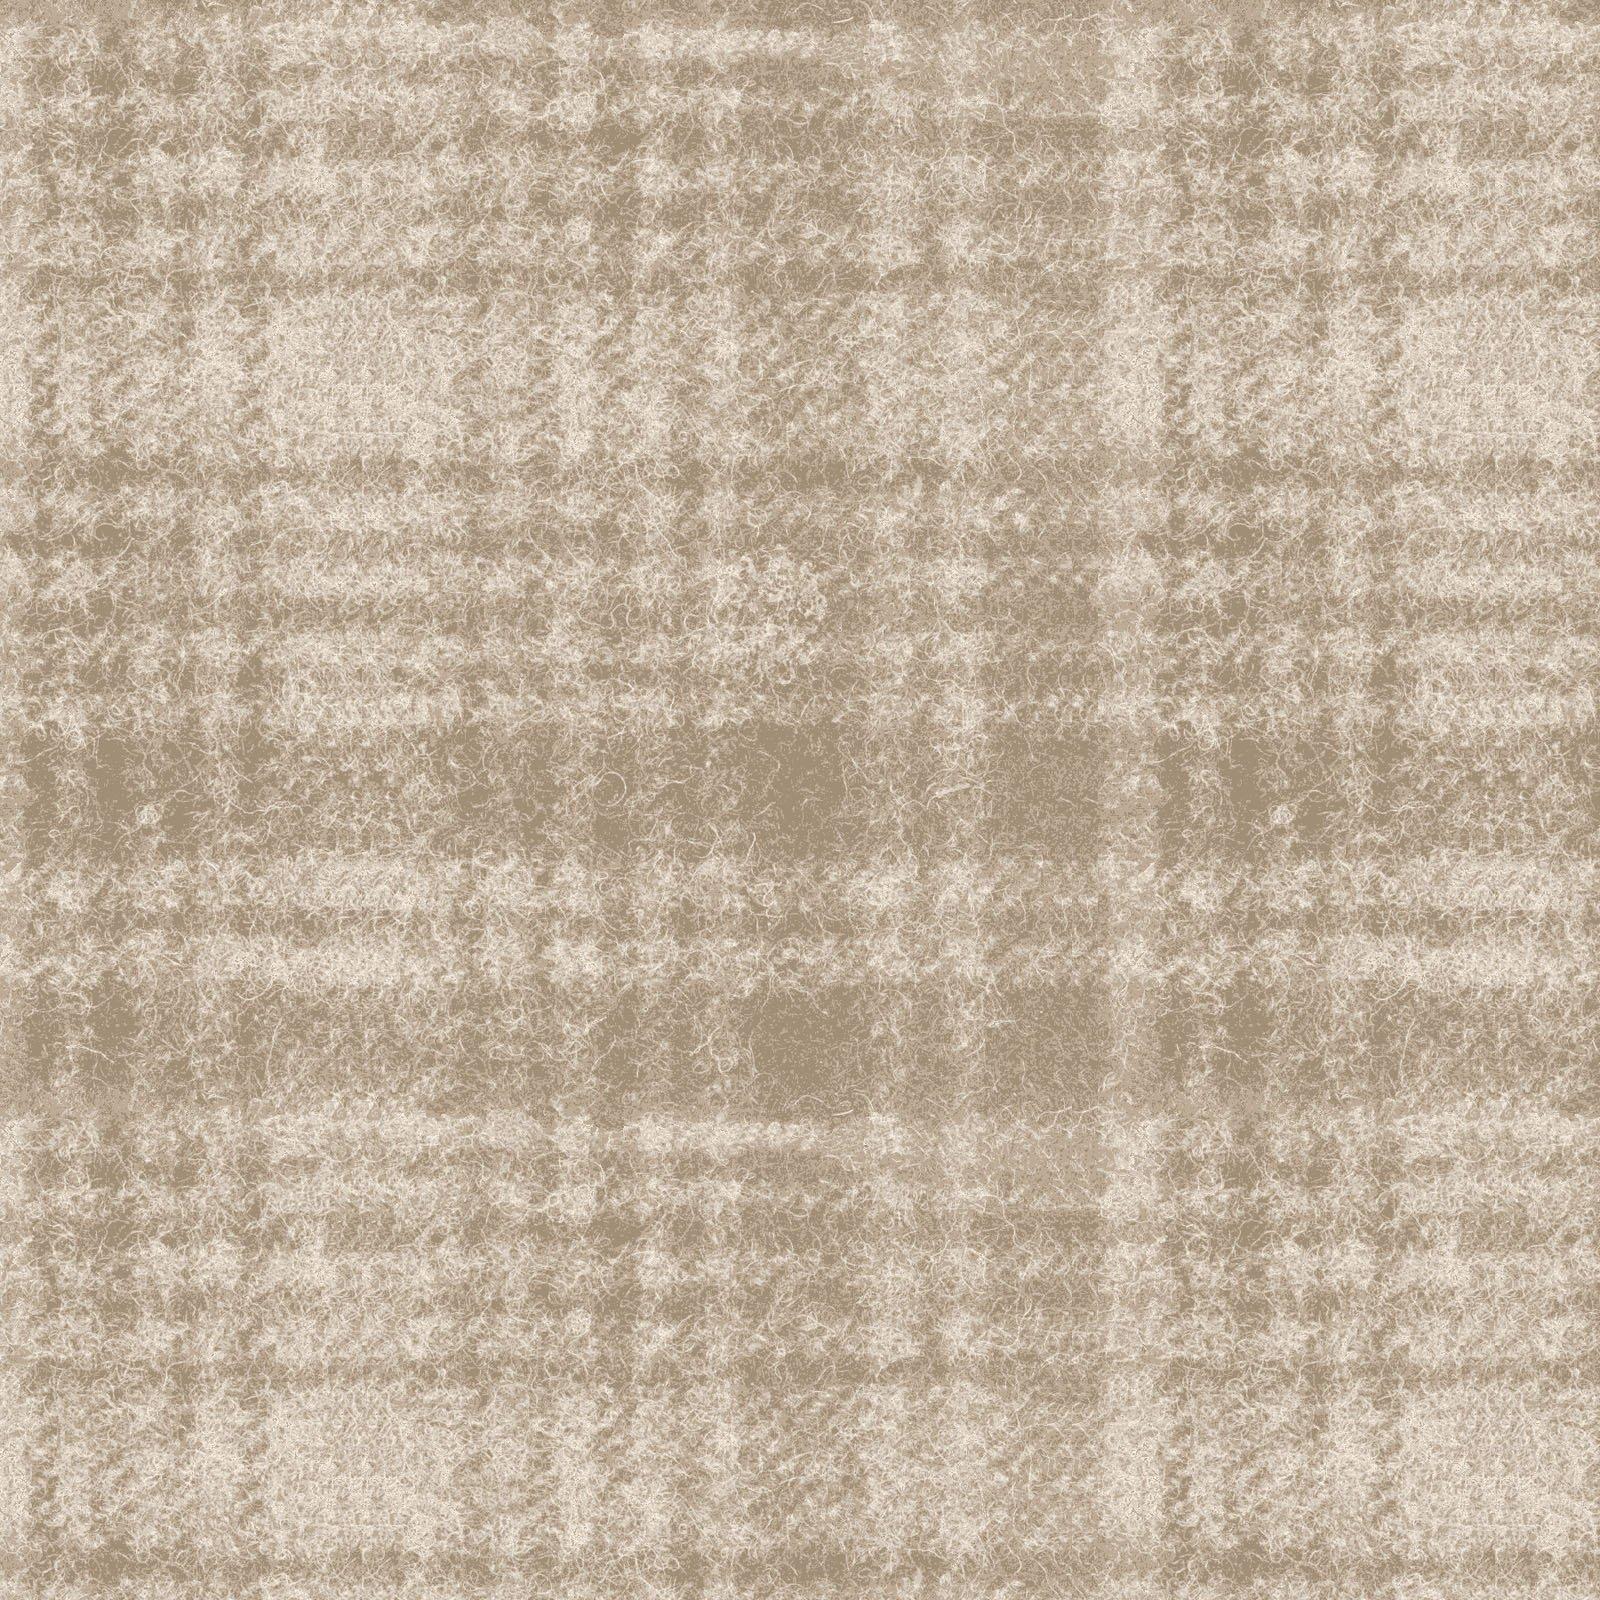 Woolies Flannel - Windowpane - Light Tan - 1/2 Yd Cuts